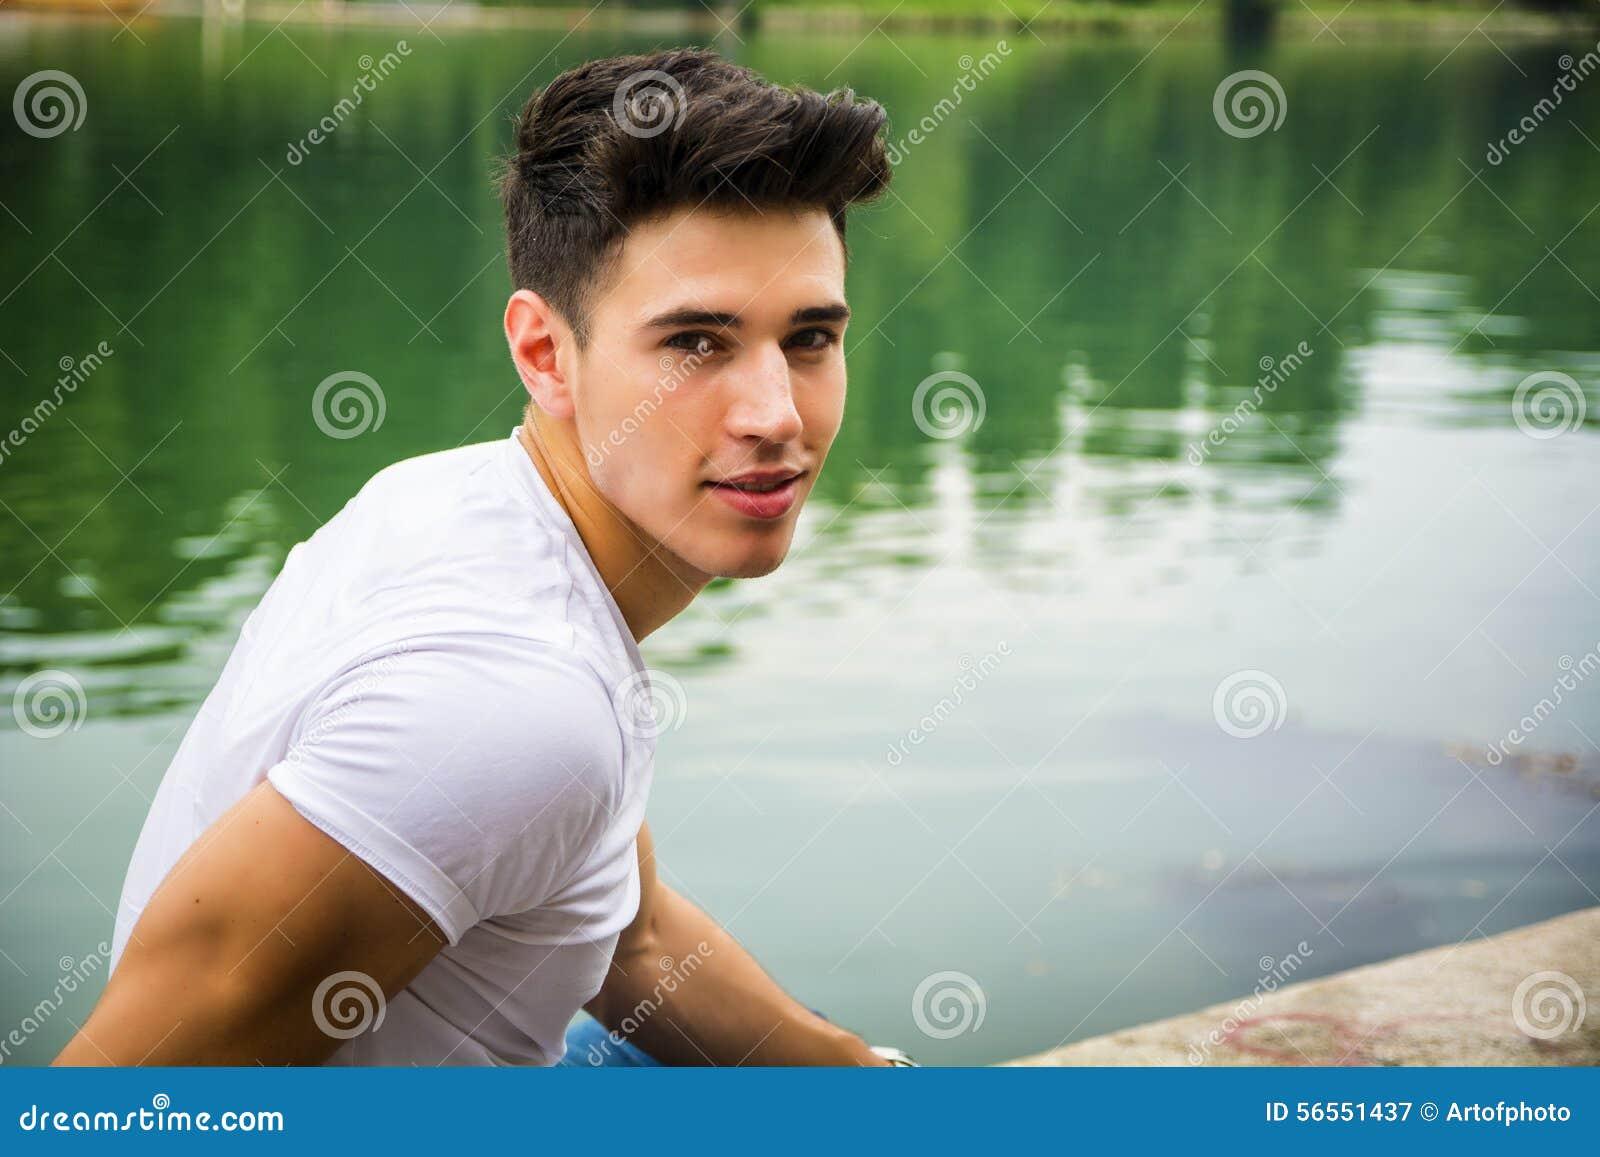 Download Όμορφος νεαρός άνδρας στην ακτή ή τον ποταμό μιας λίμνης Στοκ Εικόνα - εικόνα από αρσενικό, leisure: 56551437